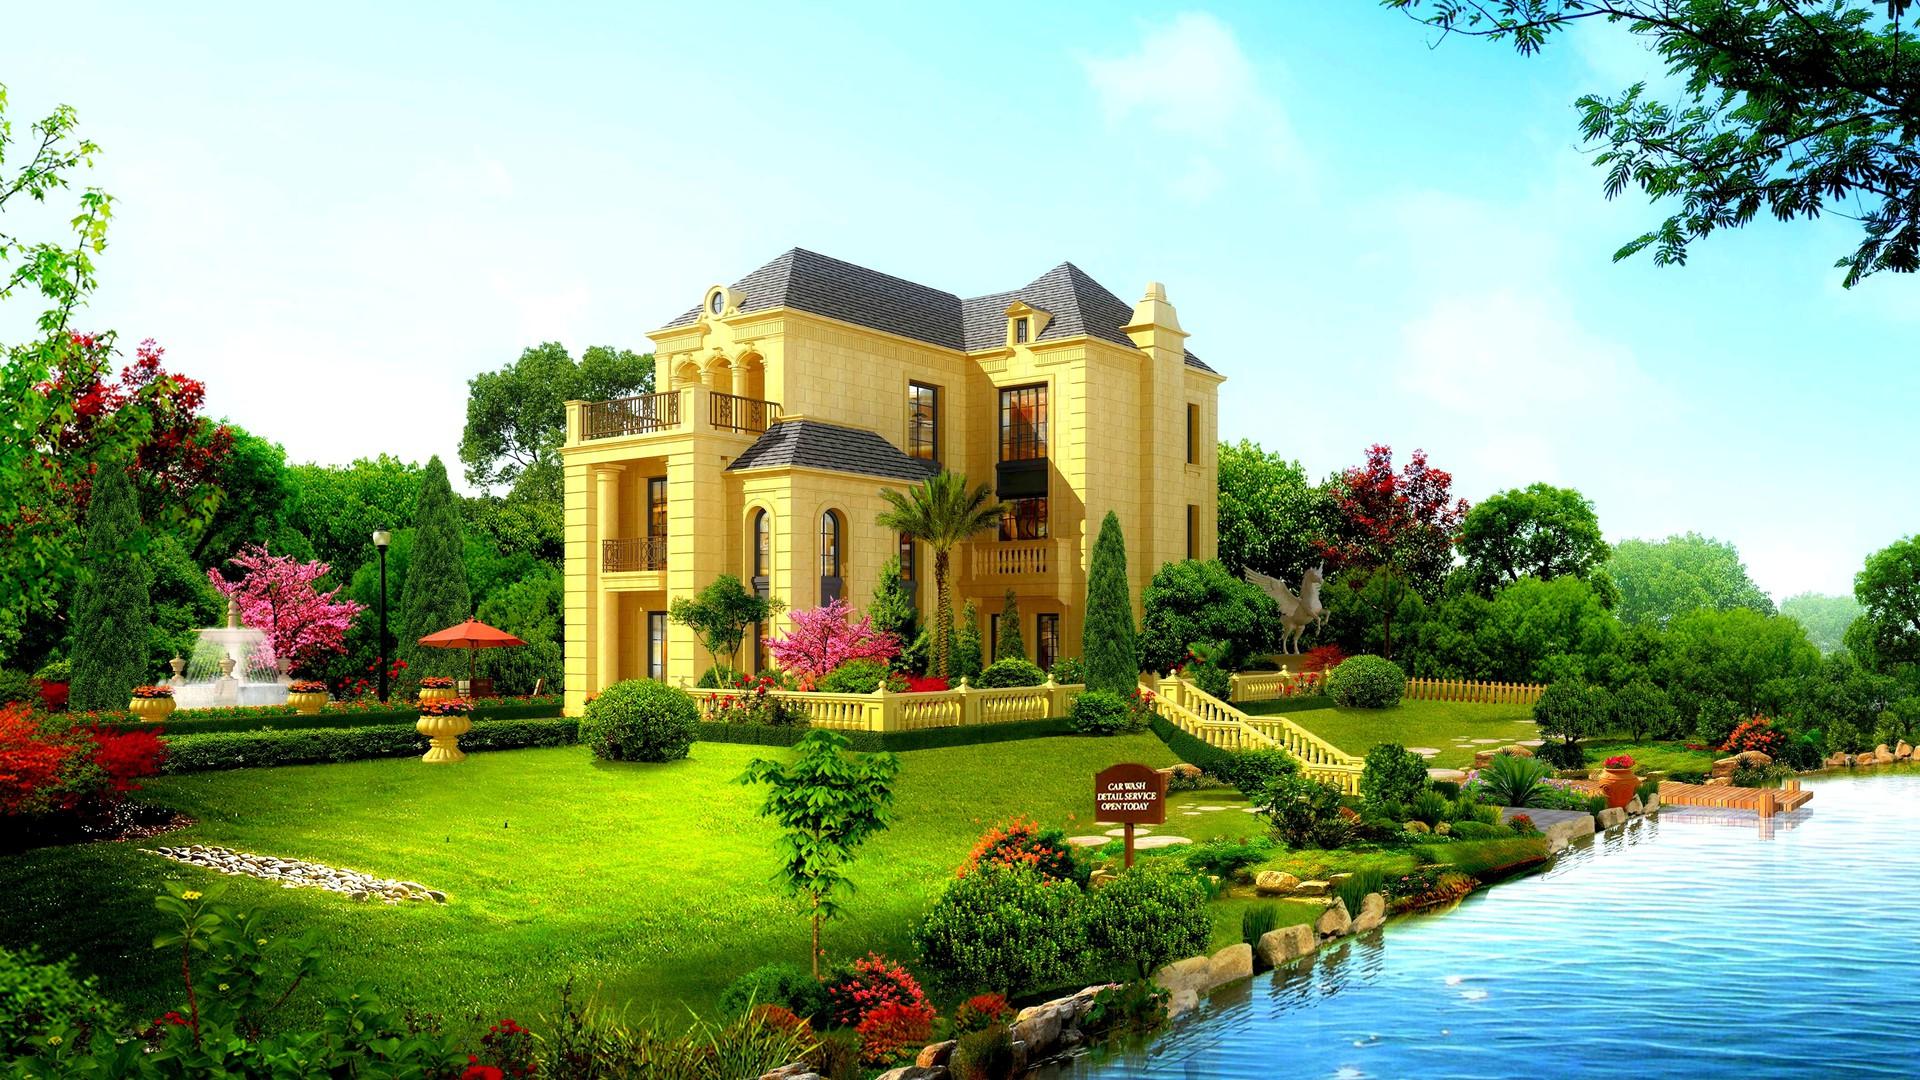 Beautiful house wallpaper 10490 PC en 1920x1080